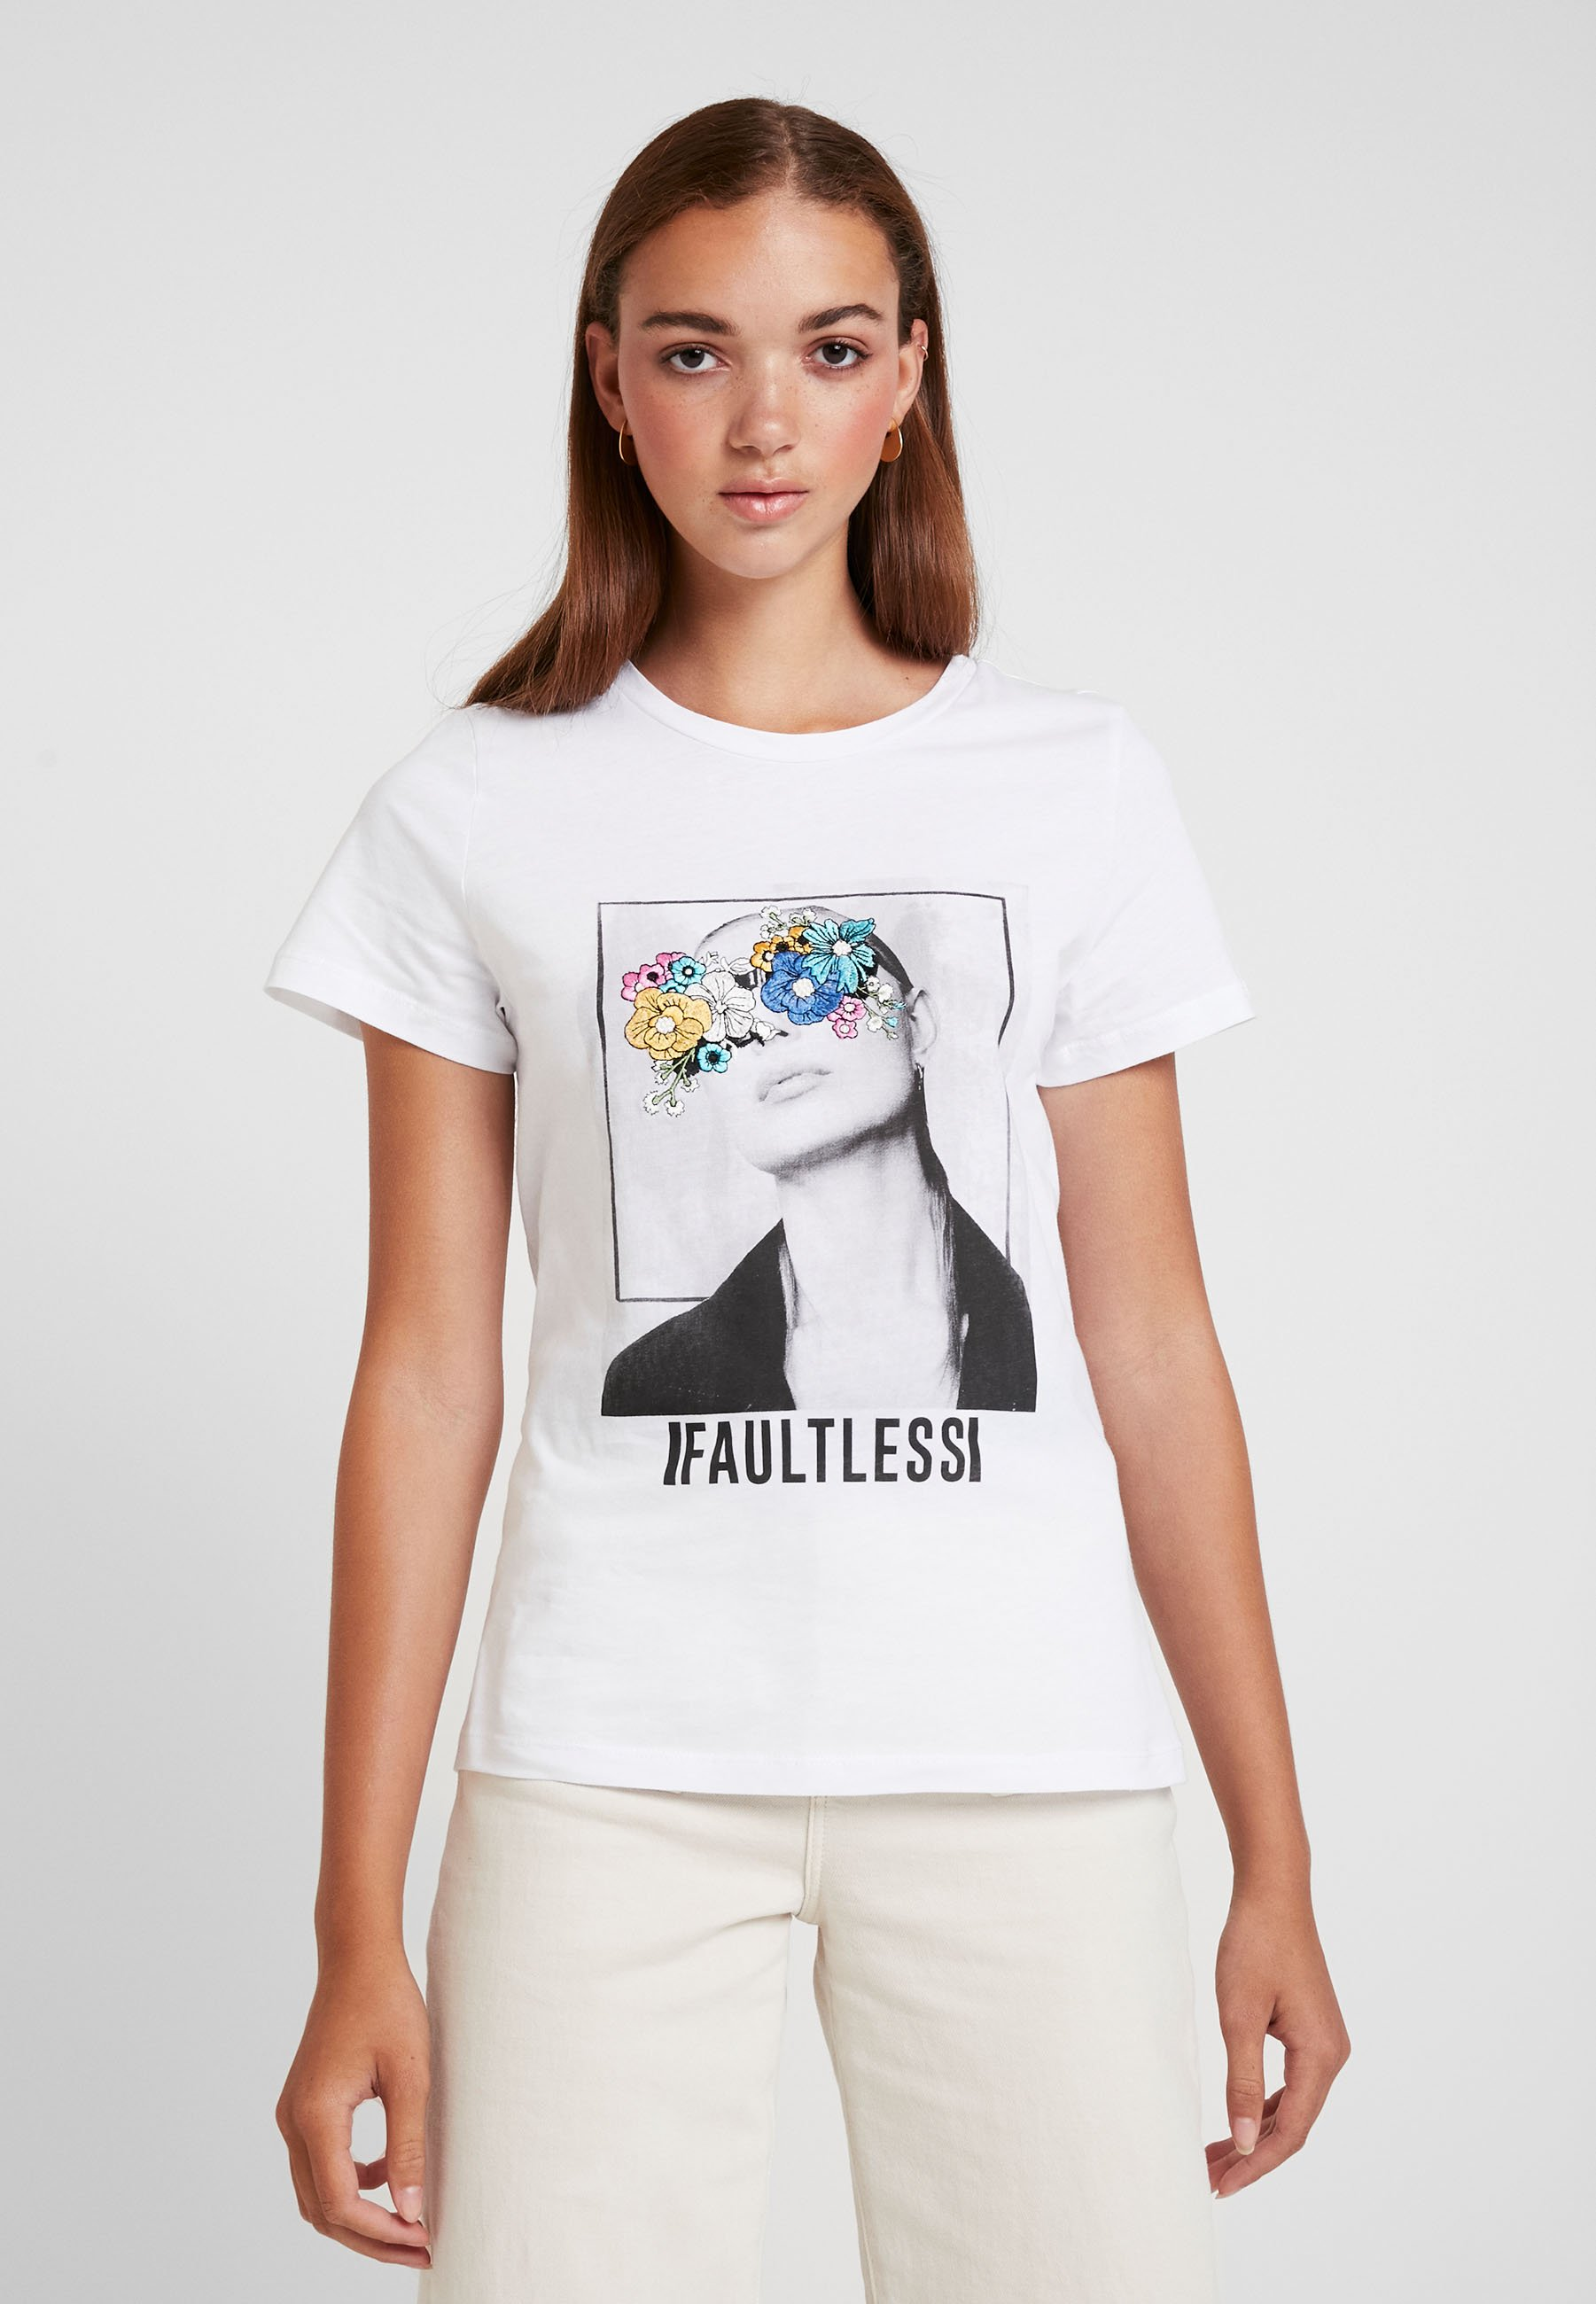 May Imprimé White shirt Noisy Nmnate FlowerT Bright 8PnkXwO0